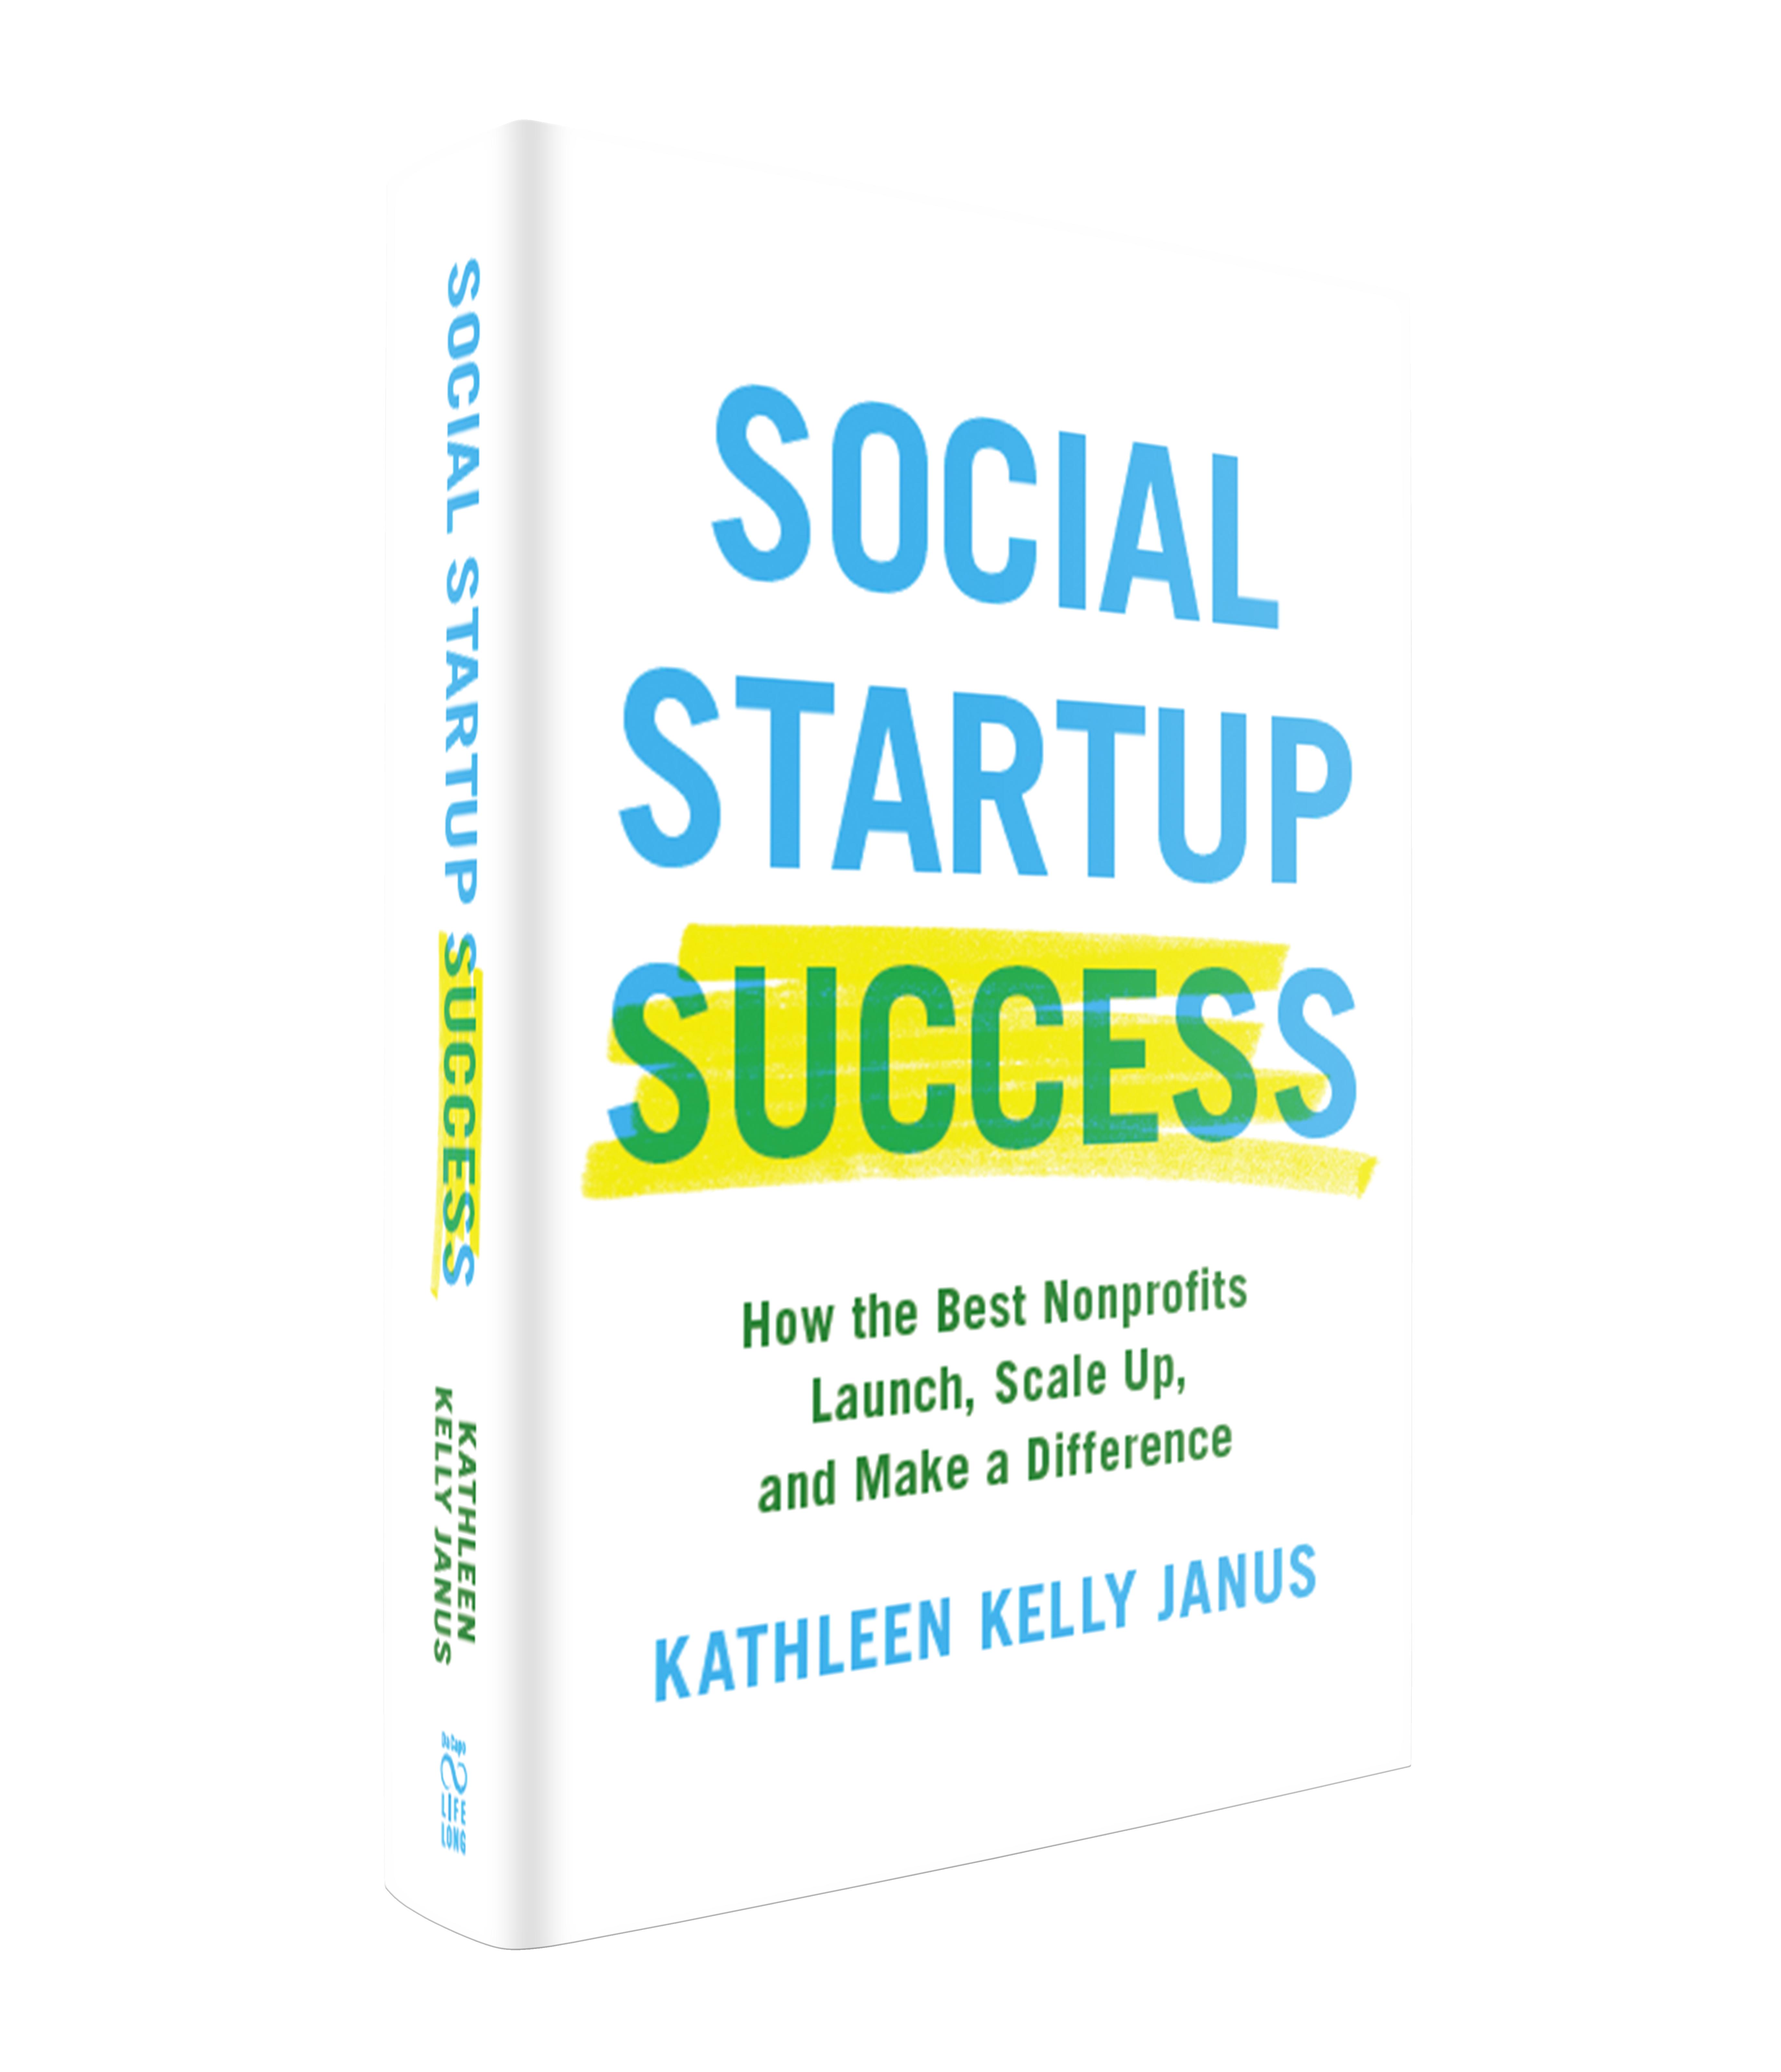 S3: Kathleen Kelly Janus - Stanford, Book #93 - Bonfires of Social